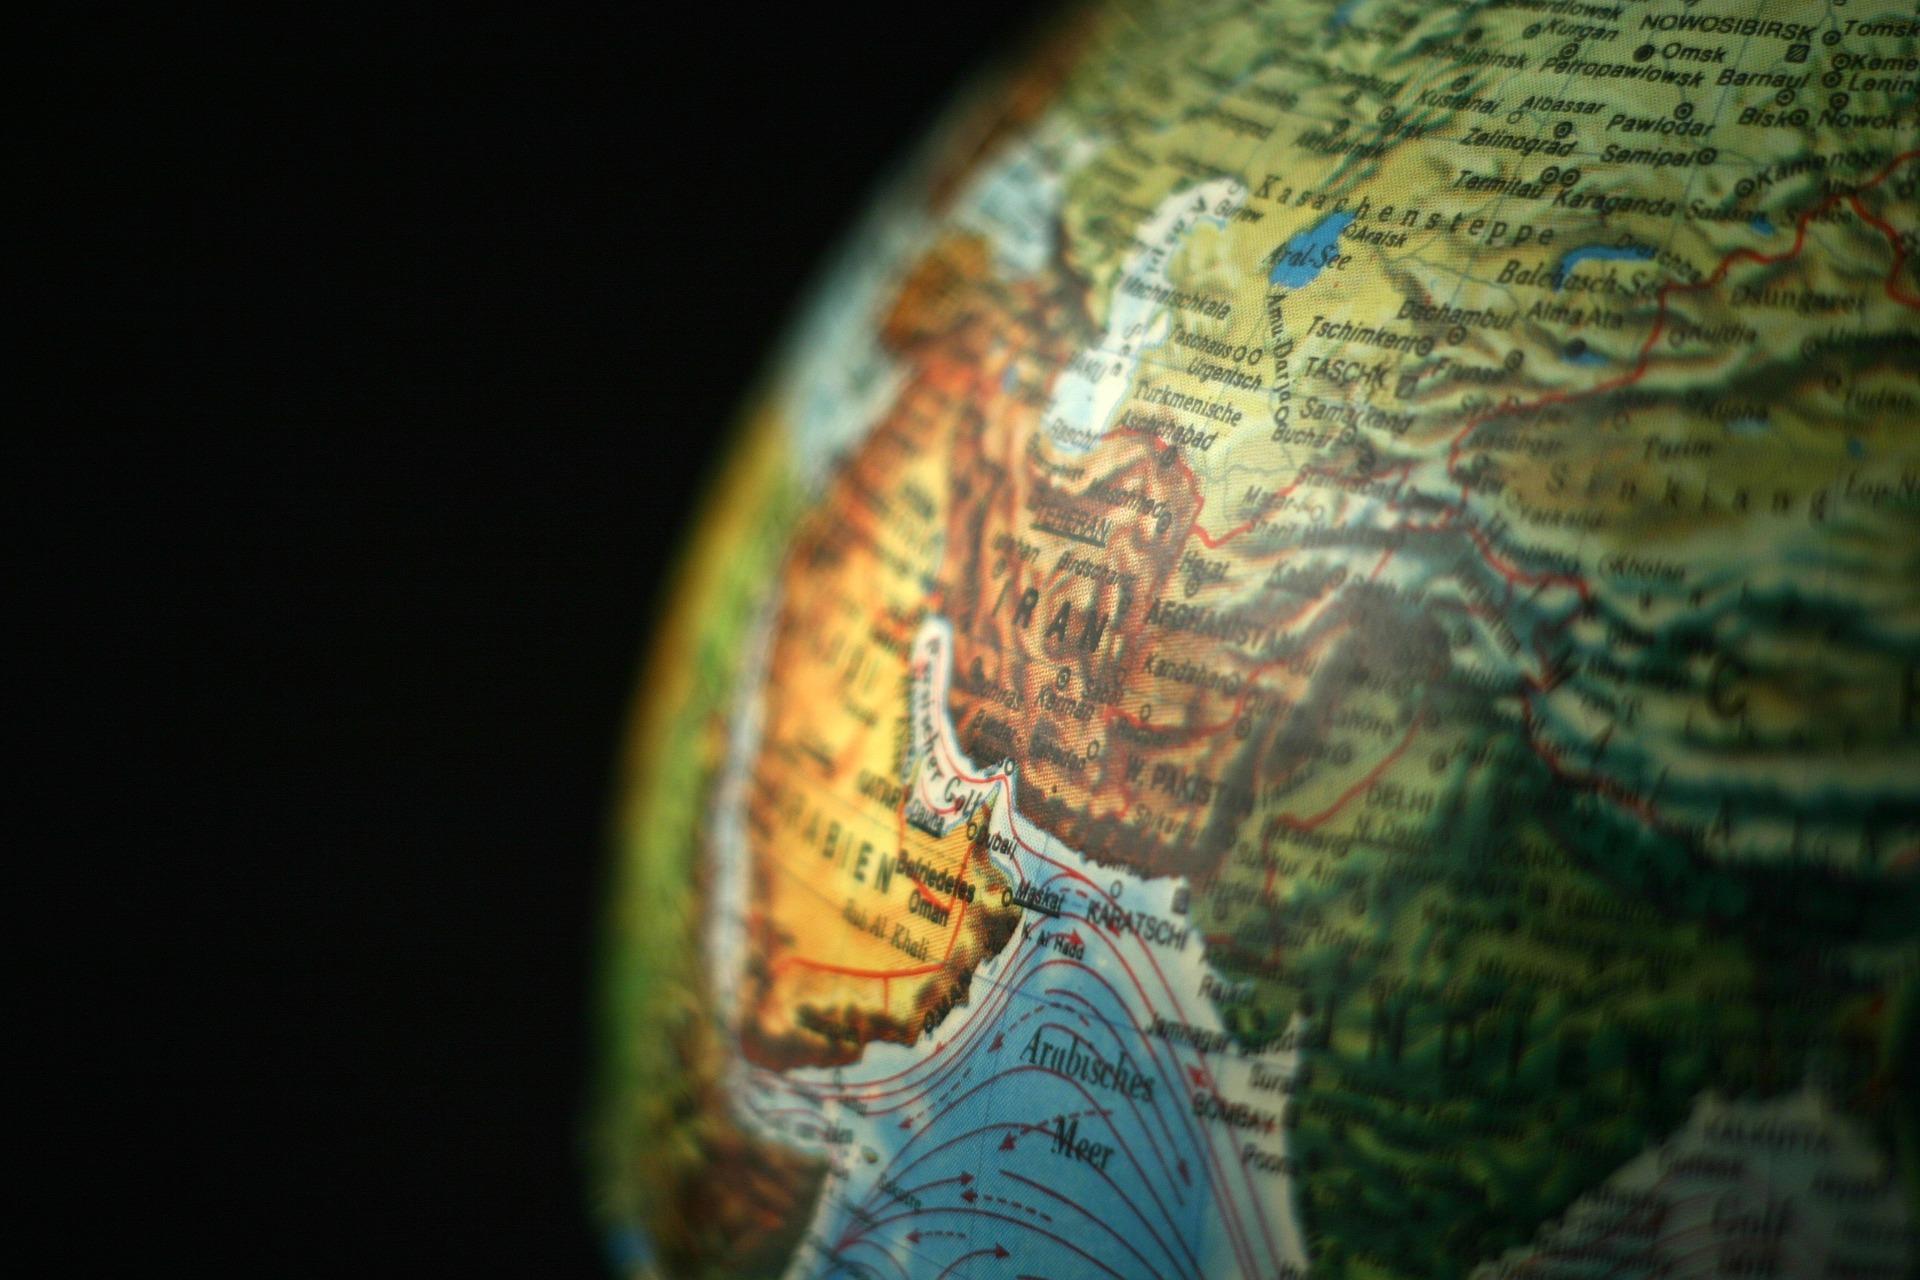 Christians smuggle Bibles into Iran